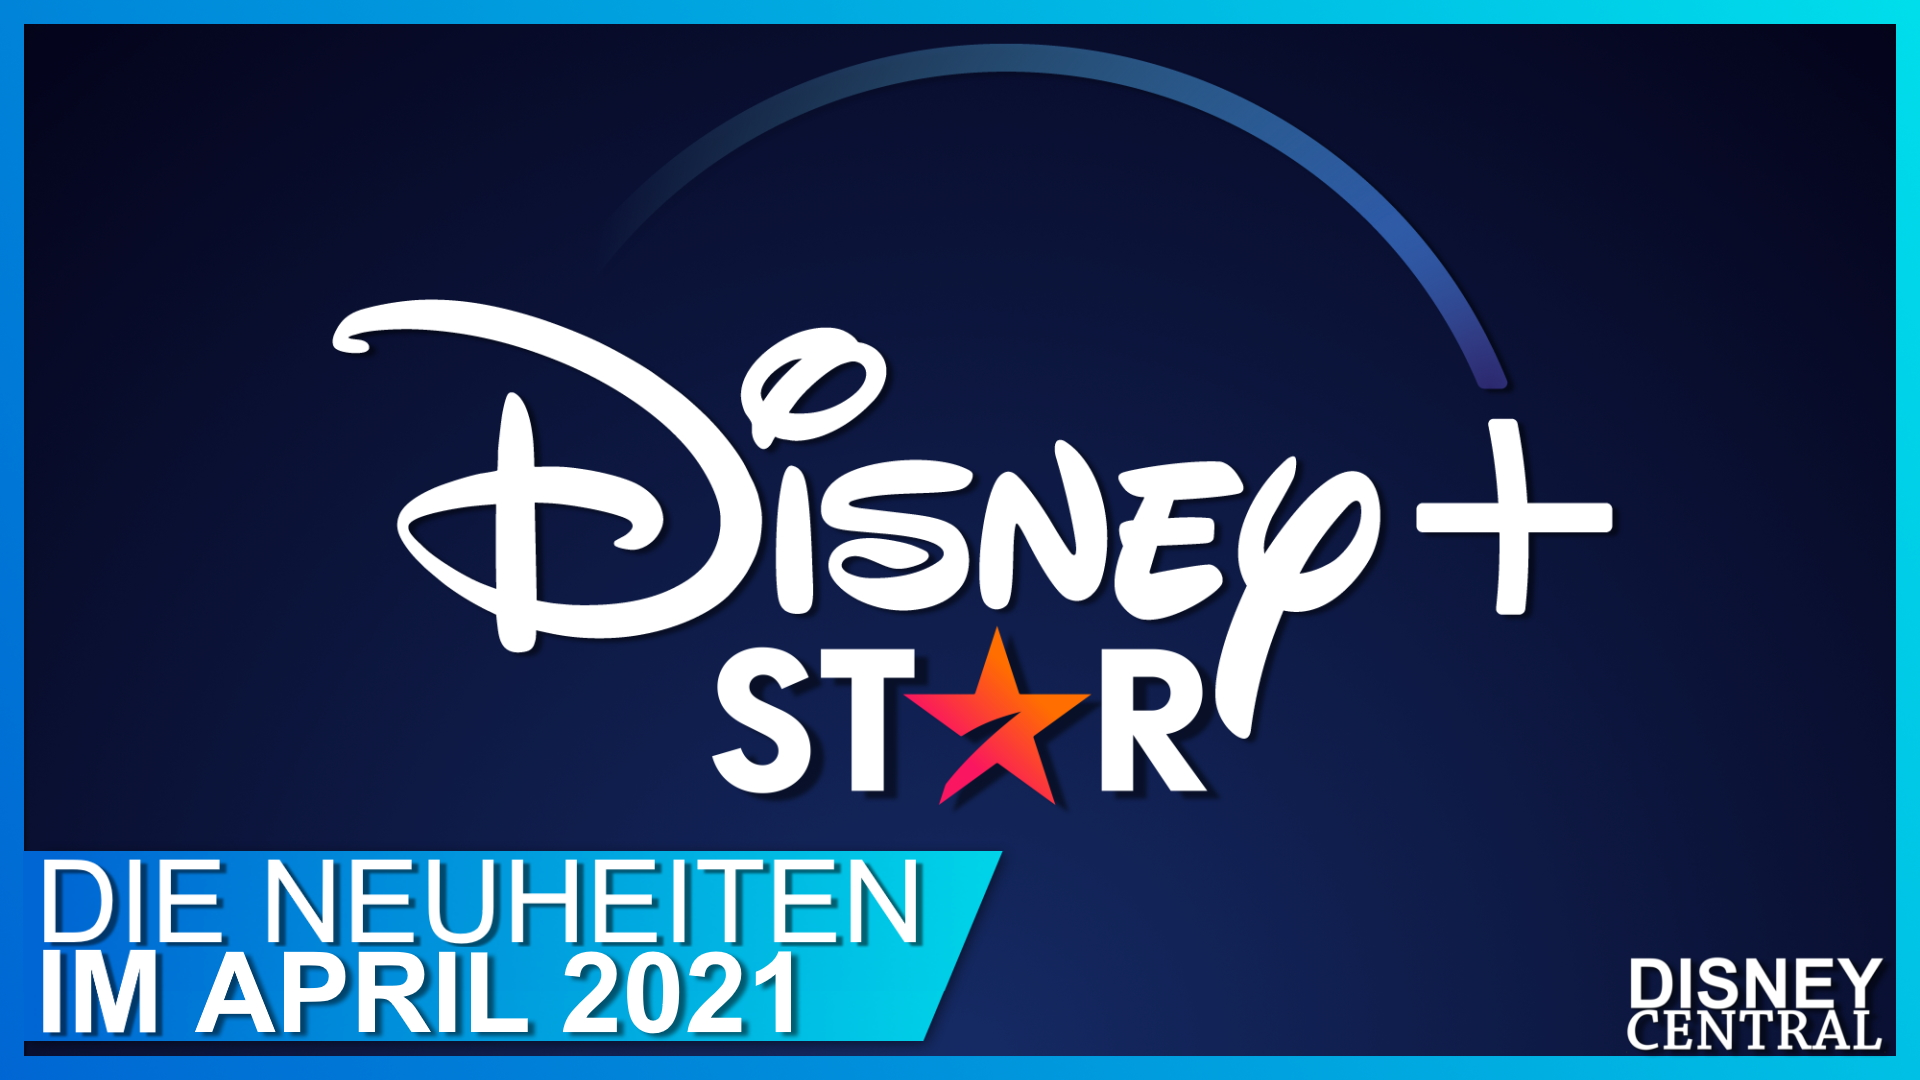 Disney+ Star Neuheiten April 2021